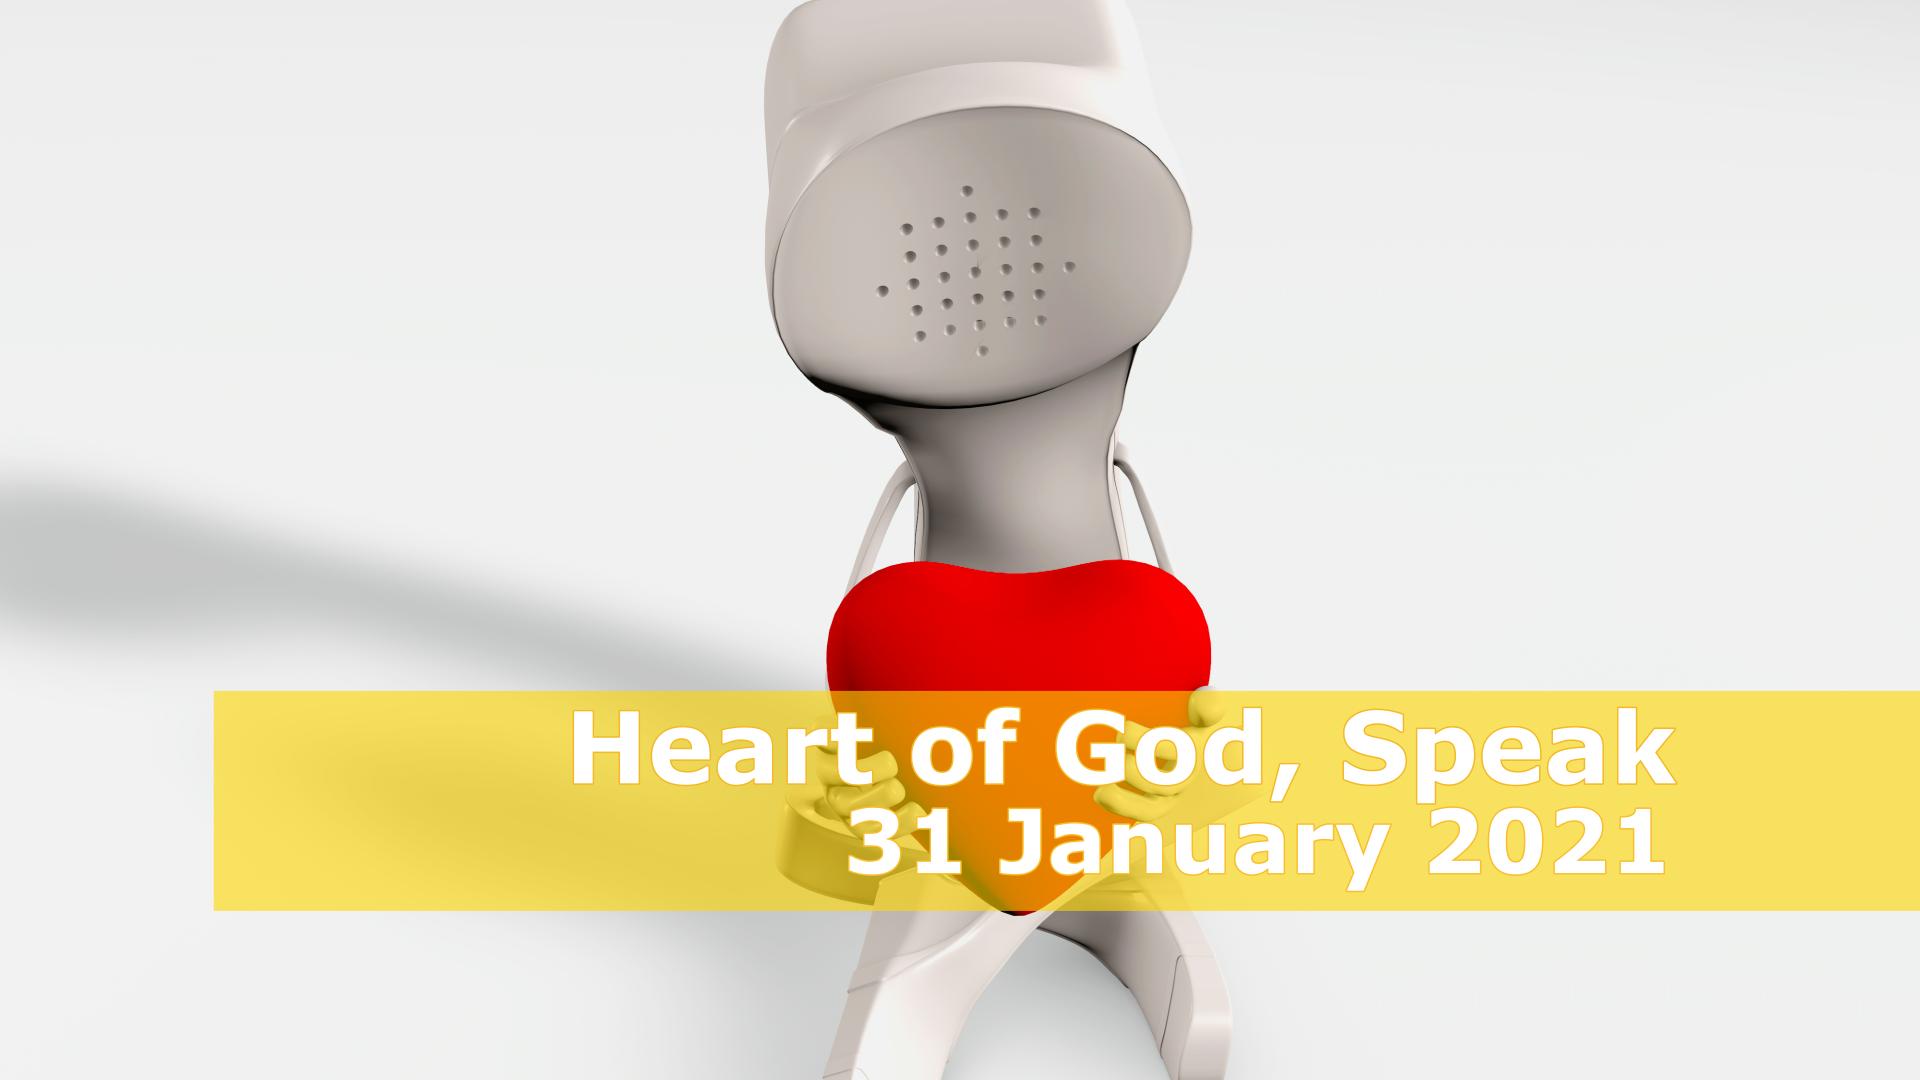 <span class='p-name'>Heart of God, Speak — 31 January 2021 Devotional</span>